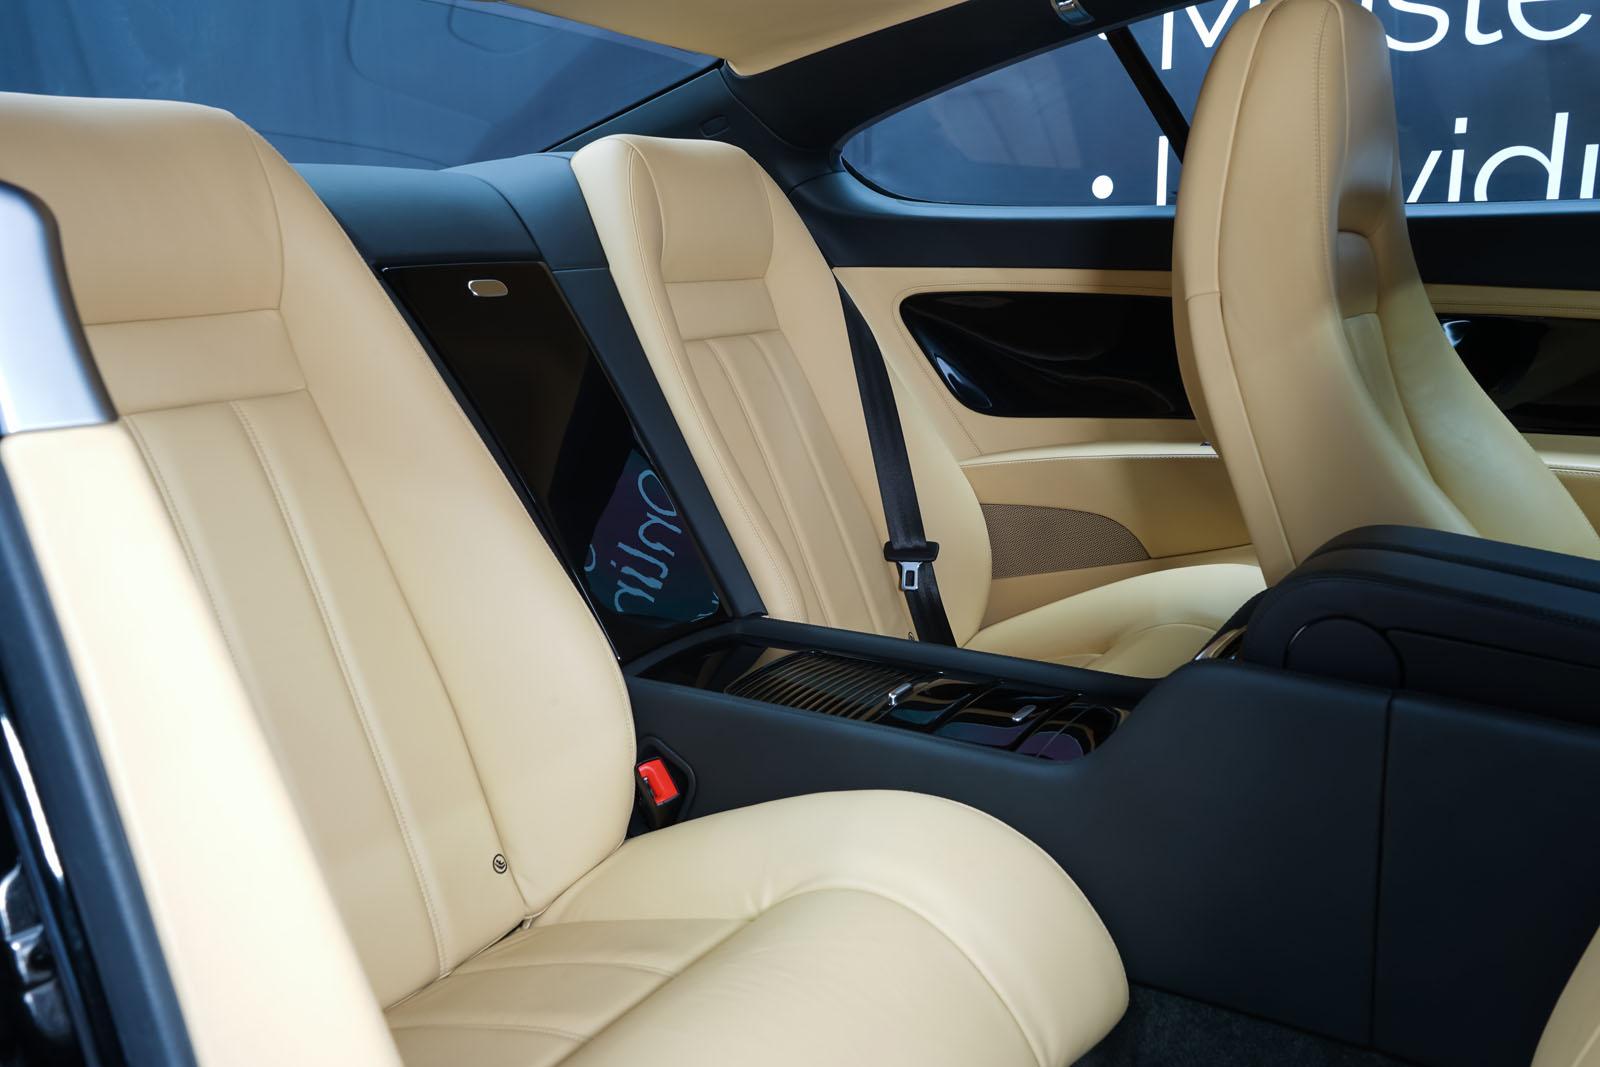 Bentley_Continental_GT_Schwarz_Beige_BEN-1159_19_w